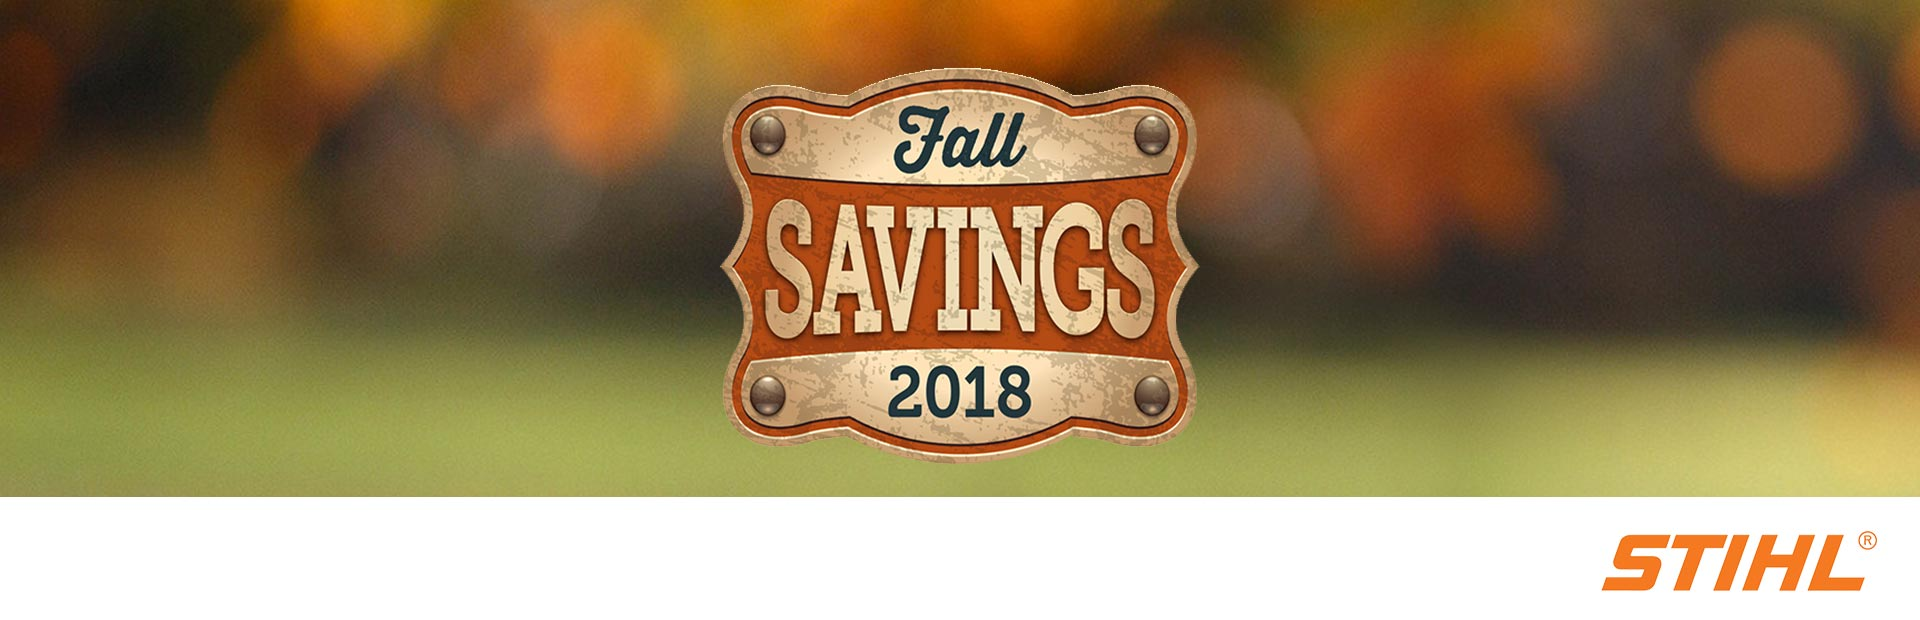 STIHL - STIHL Fall Savings 2018 HAWKINS EQUIPMENT LTD Fredericton ...